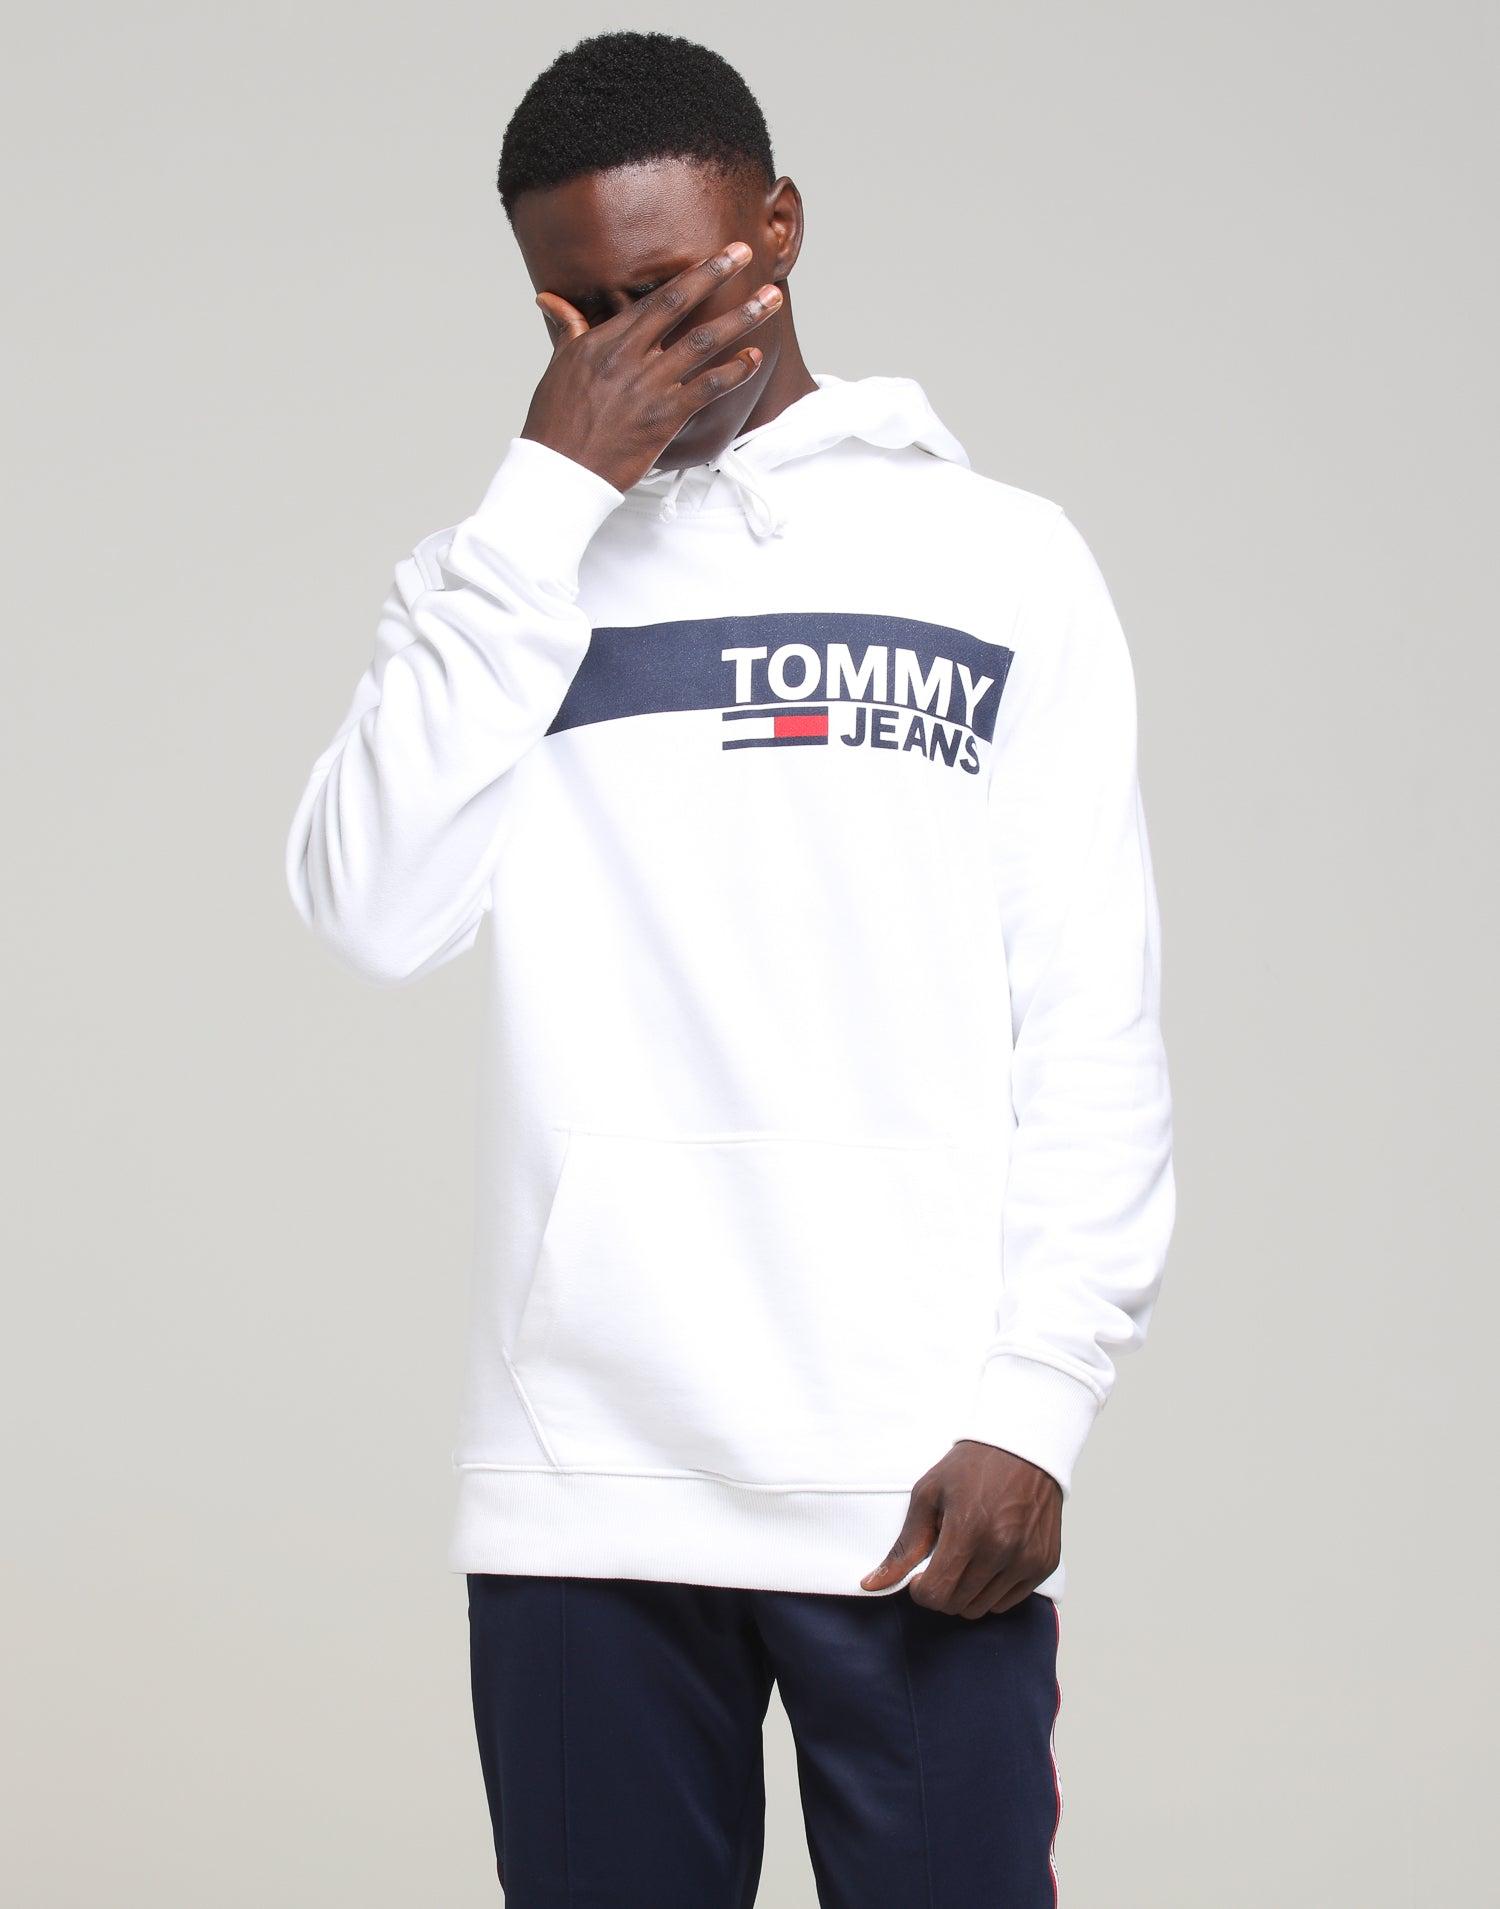 Tommy Jeans Men's TJM Essential Graphic Hoodie